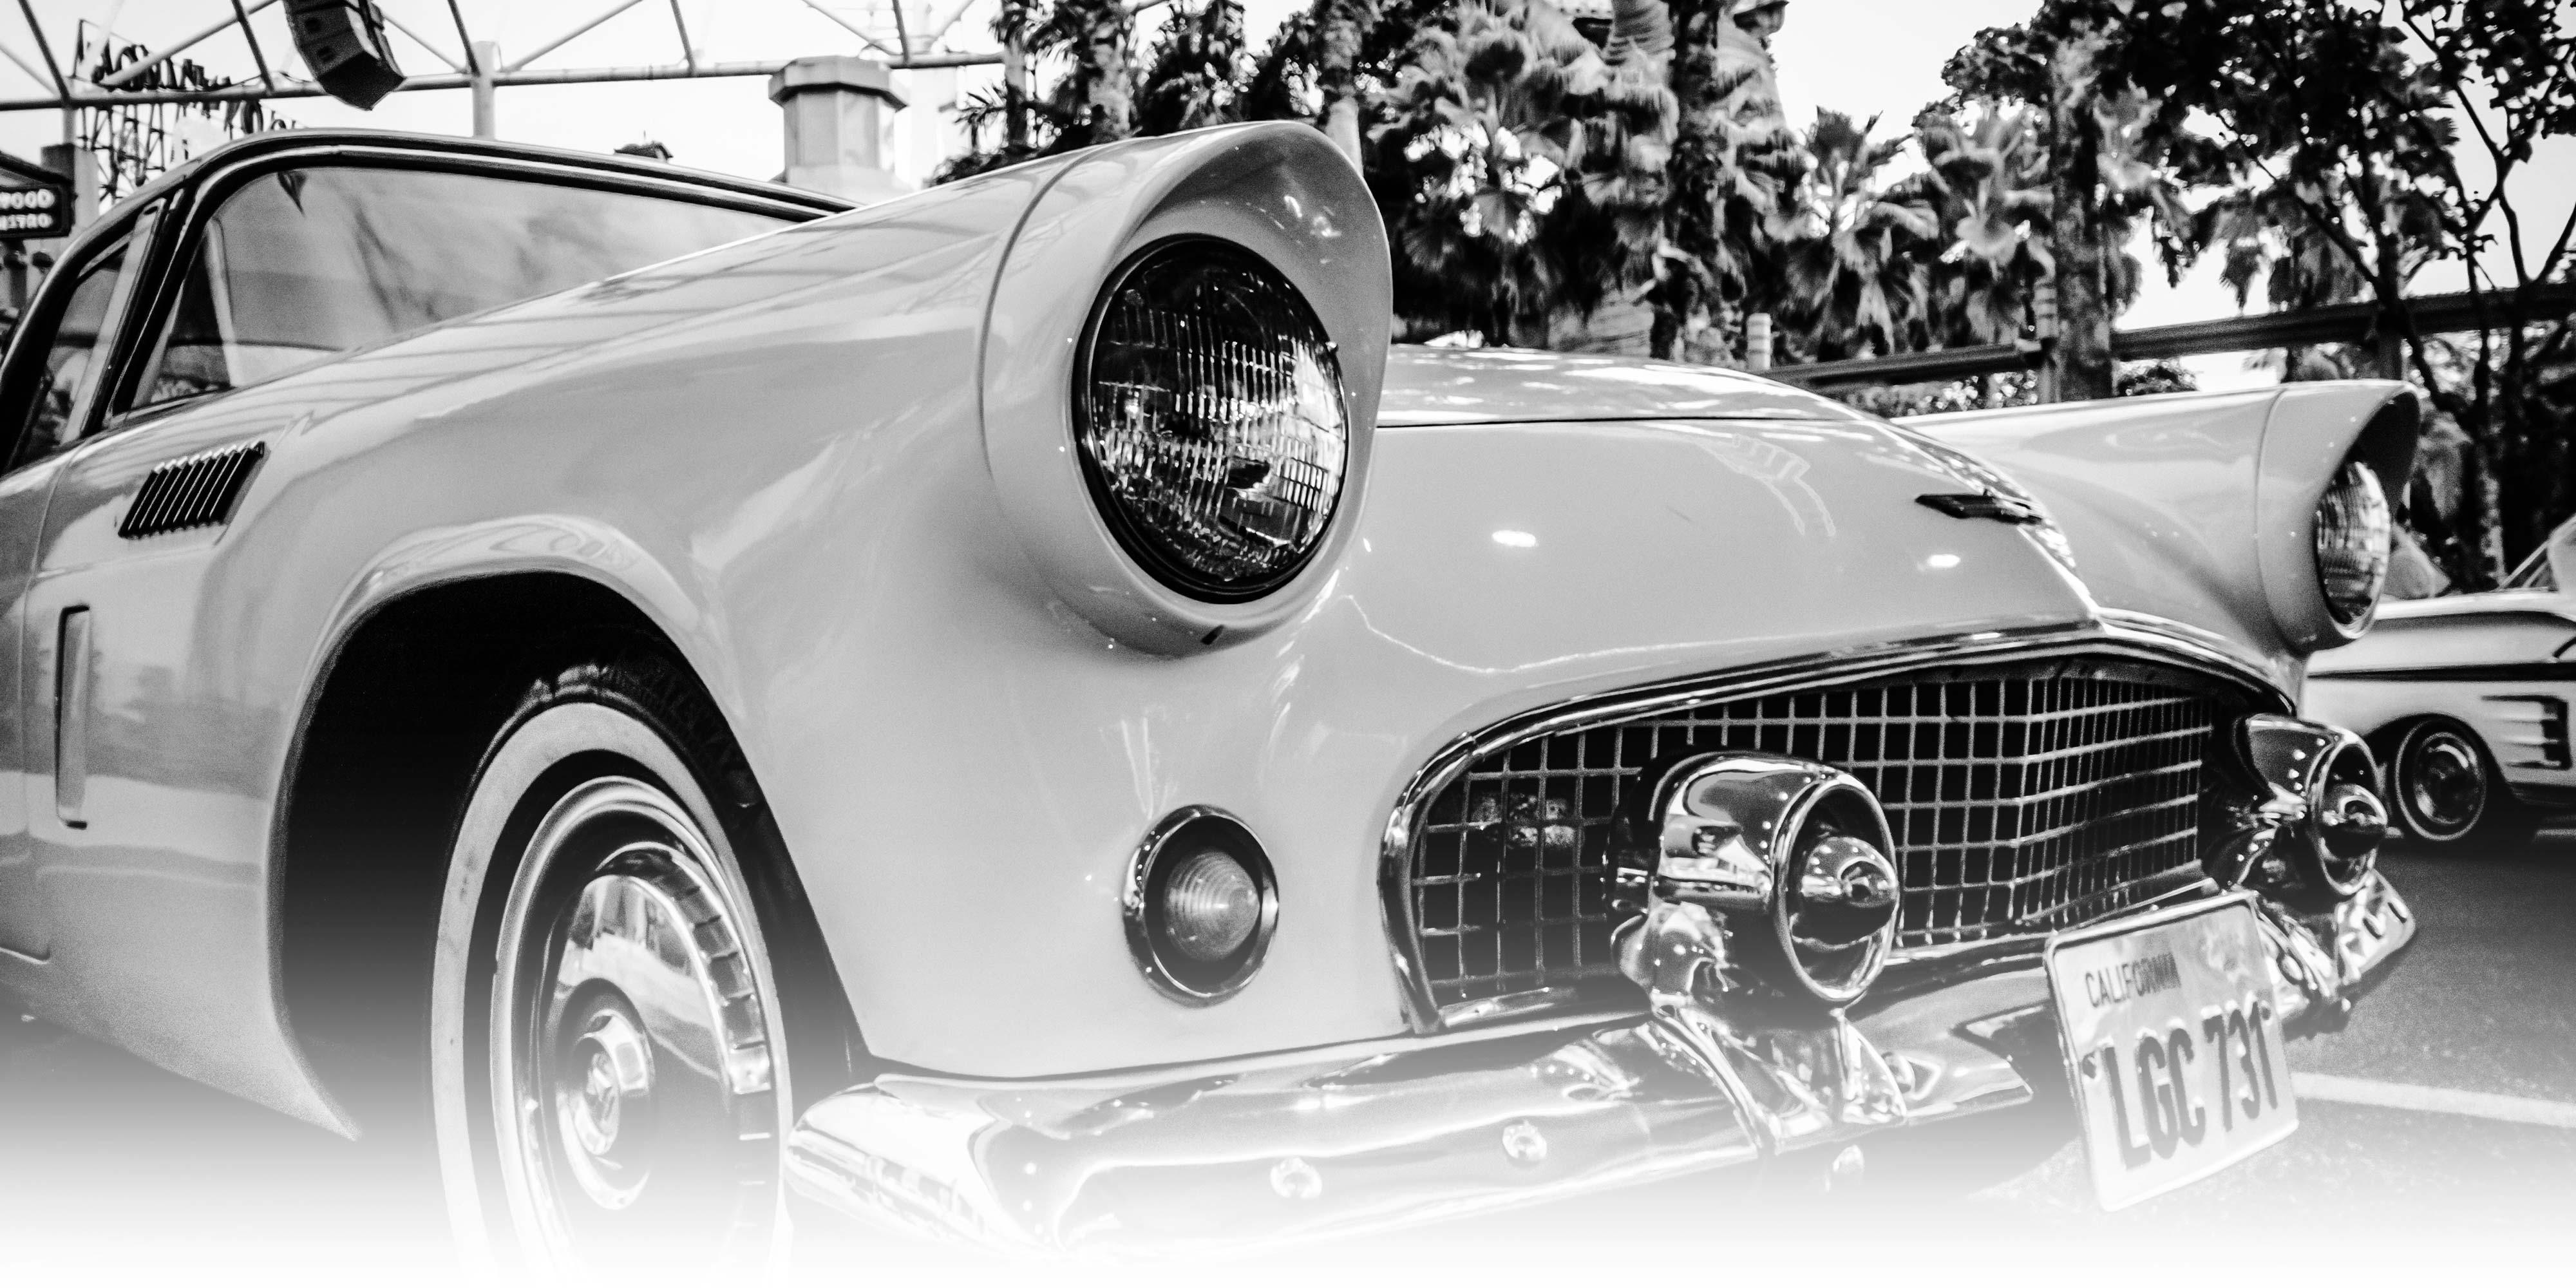 Banner Importauto compra-venta de coches clásicos